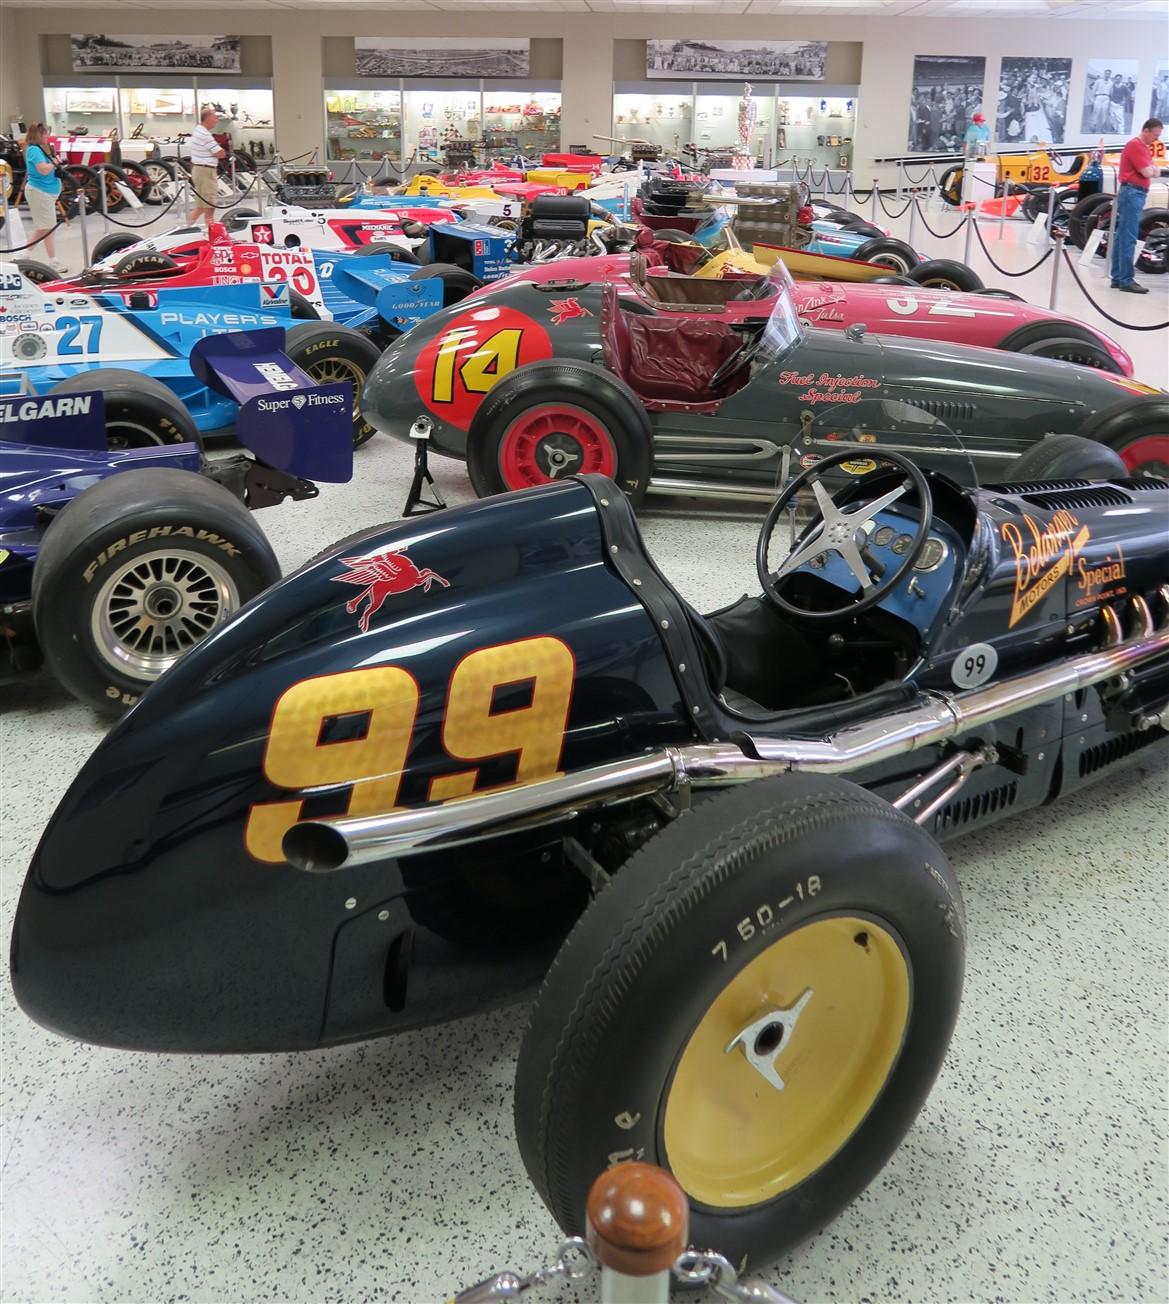 2015 07 19 123 Indianapolis Motor Speedway